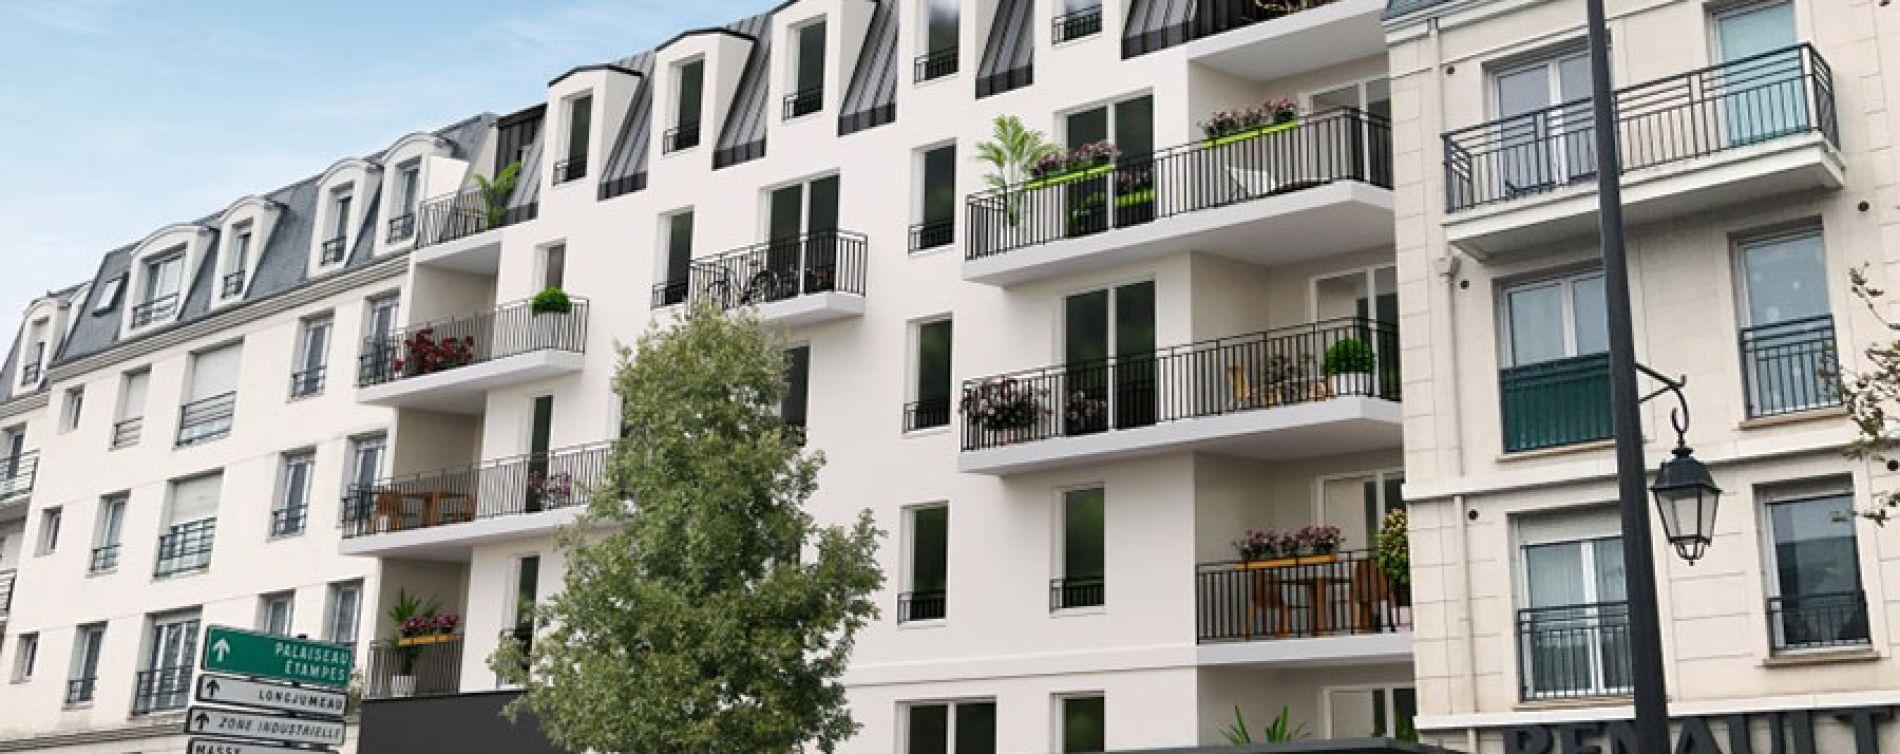 le germaine antony programme immobilier neuf n 214088. Black Bedroom Furniture Sets. Home Design Ideas